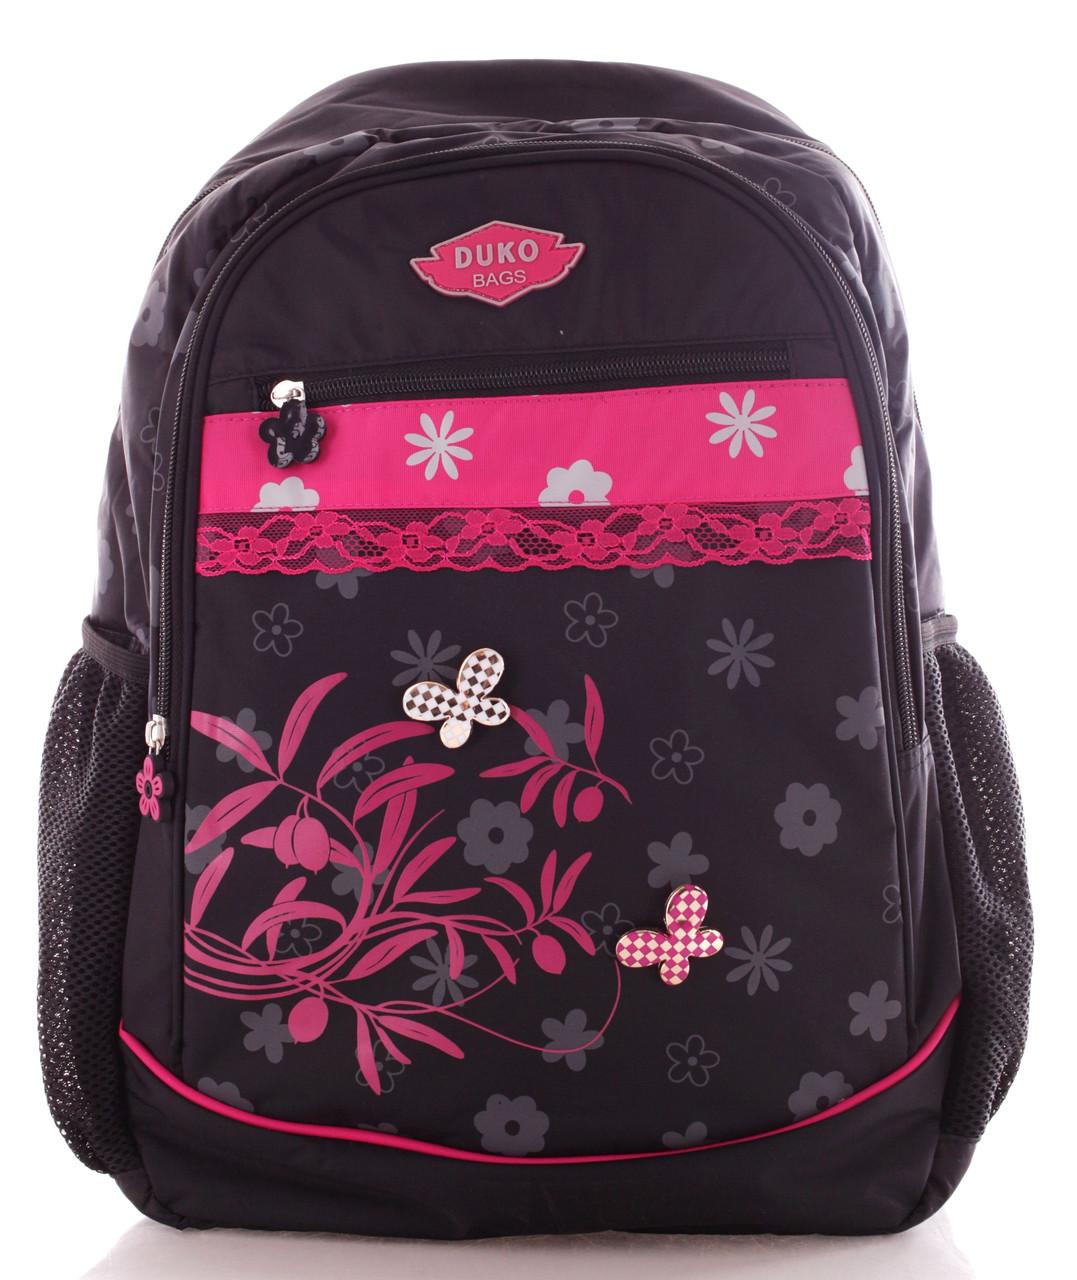 Рюкзак Bag and backpack black, черный/розовый 15 л